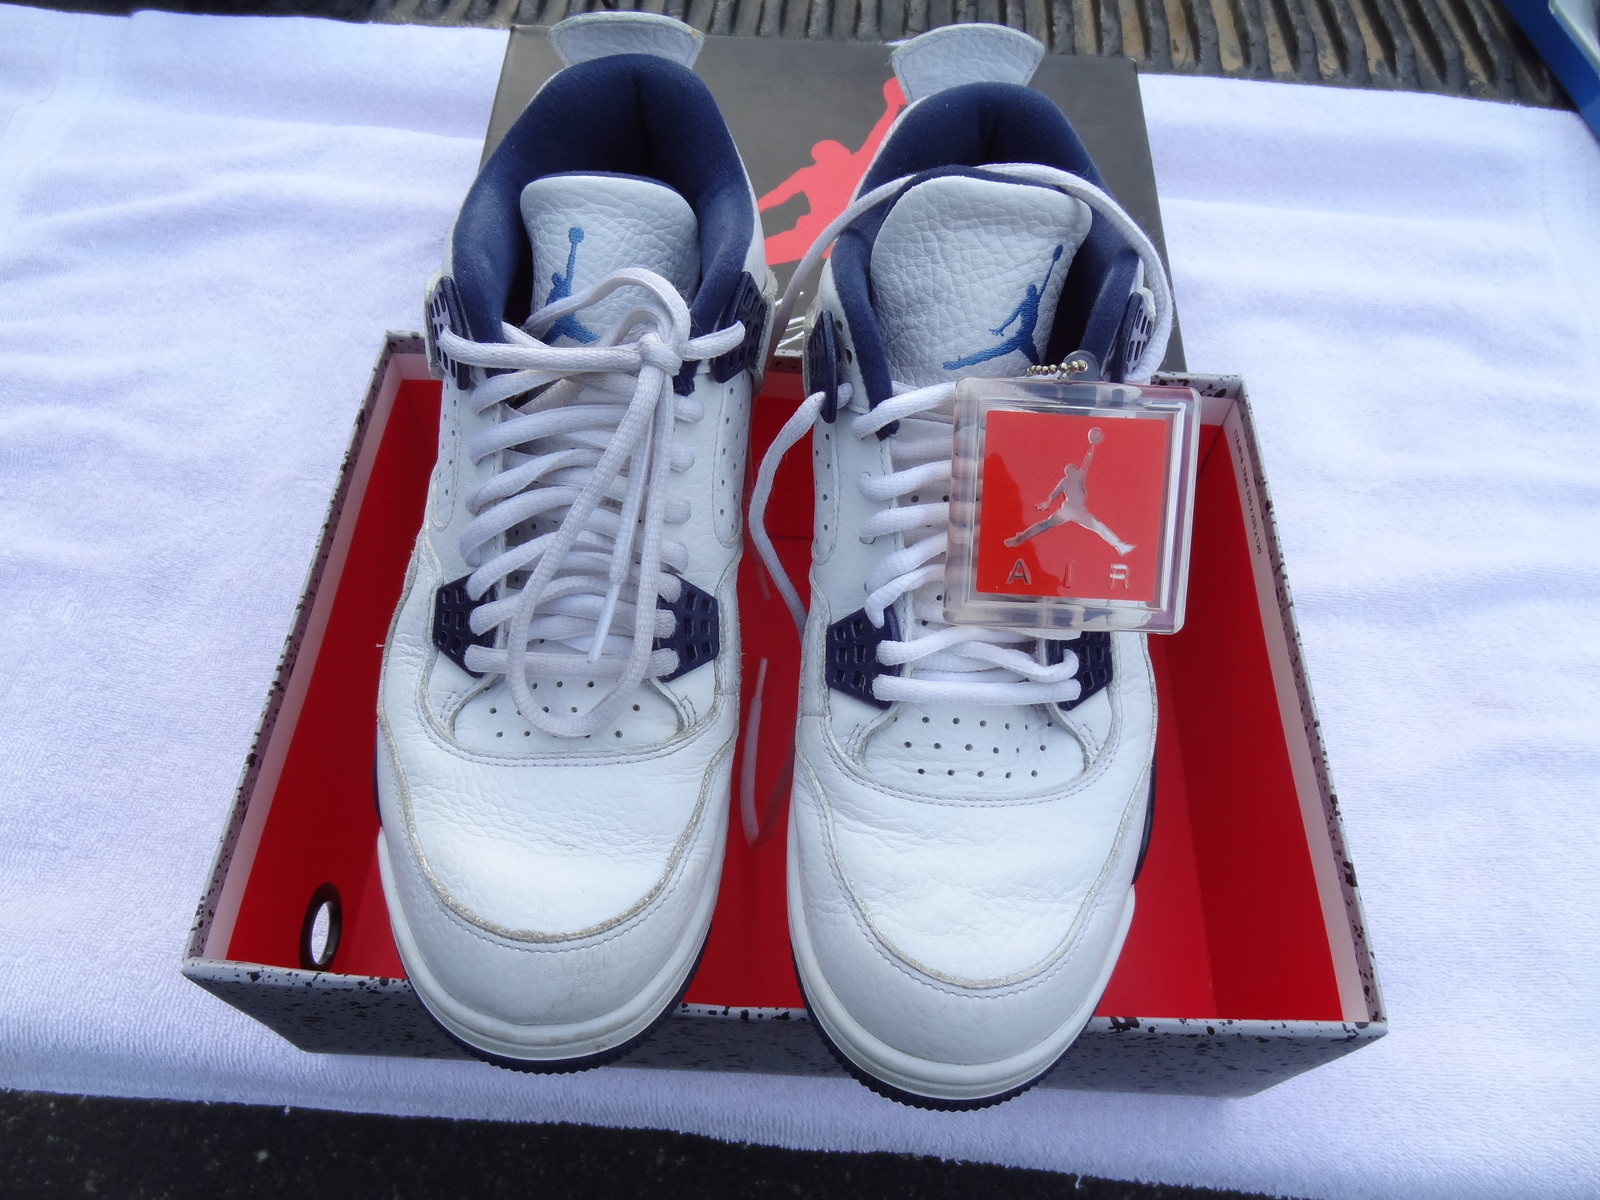 best sneakers 39ed0 21391 NIKE AIR JORDAN 4 RETRO LS WHITE   LEGEND BLUE-MIDNIGHT NAVY SIZE 8.5 N